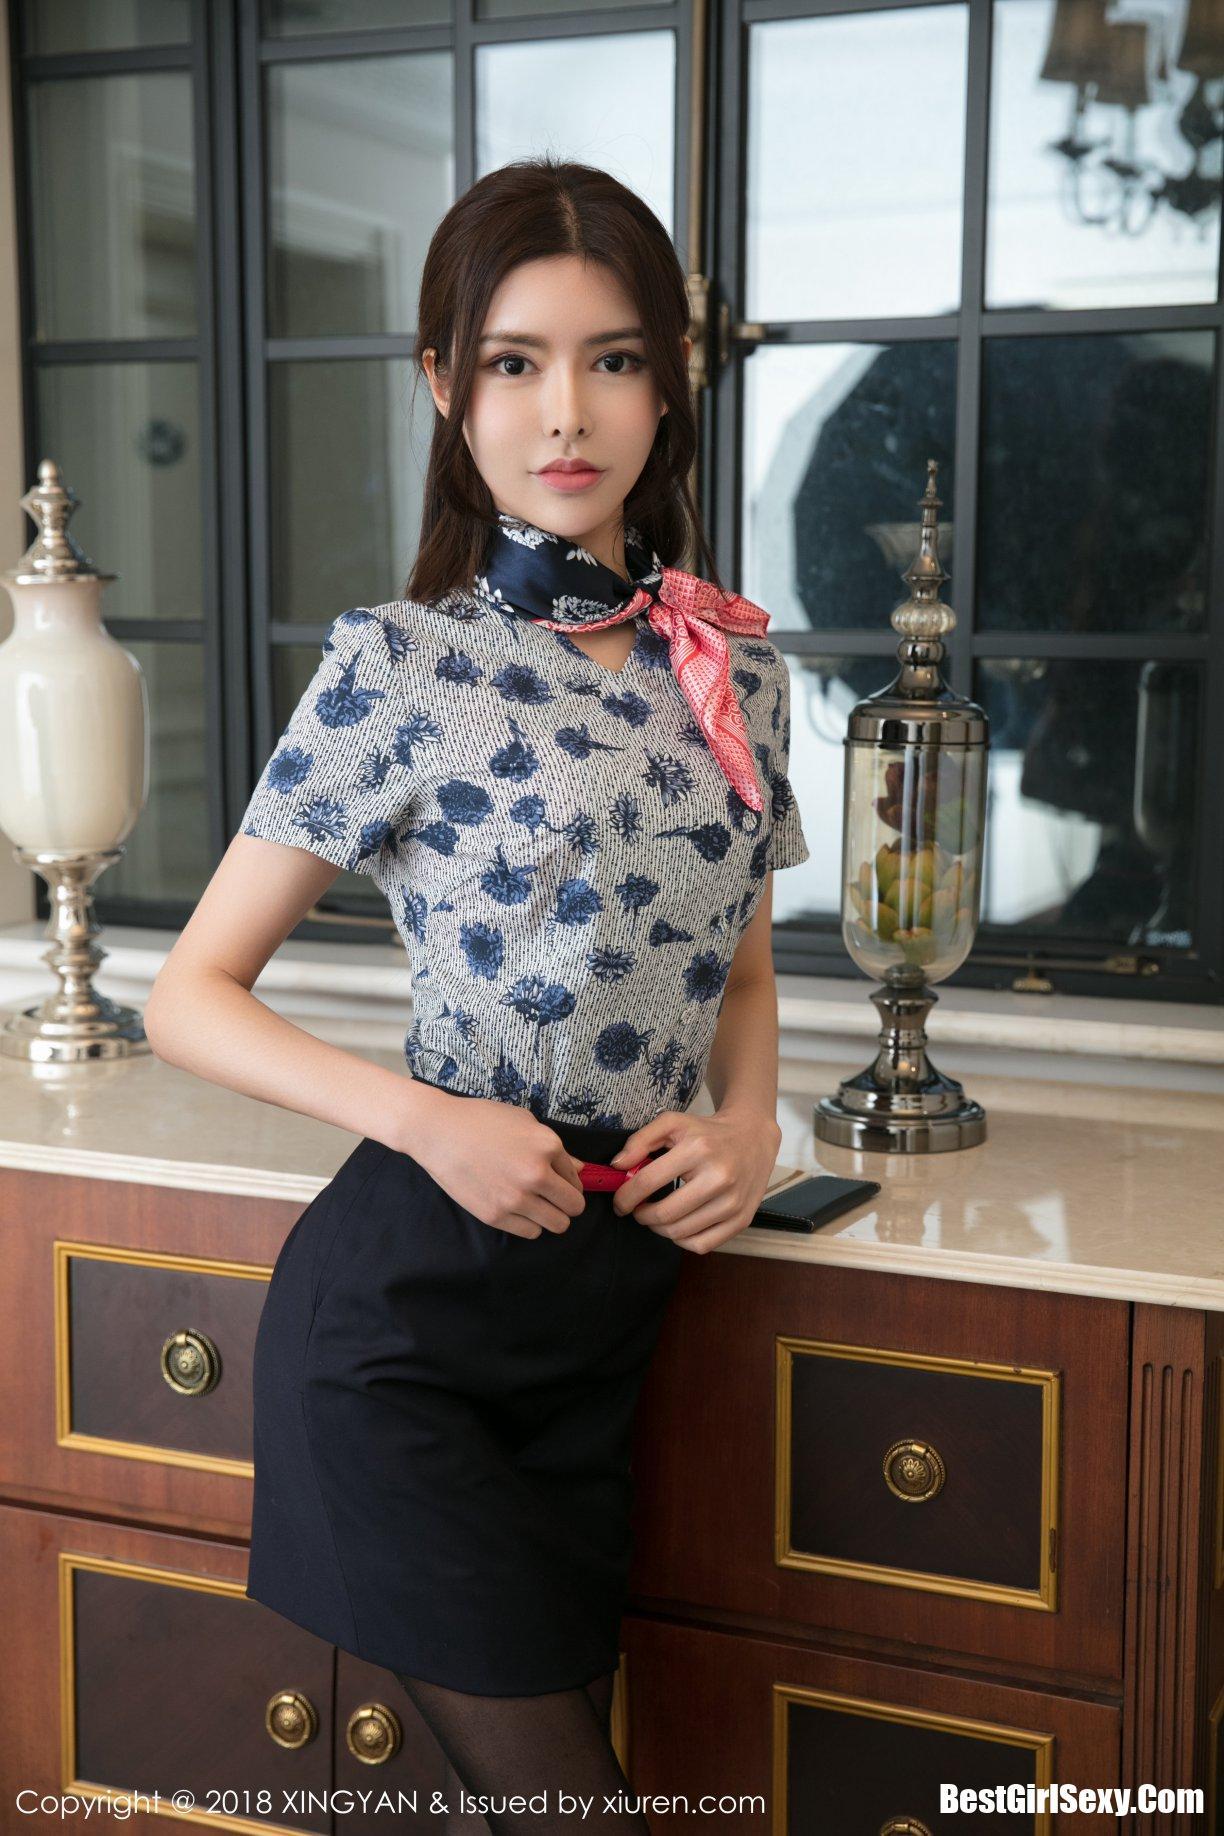 温蒂, XingYan星颜社 VOL.049 Wen Di, XingYan星颜社 VOL.049, Wen Di